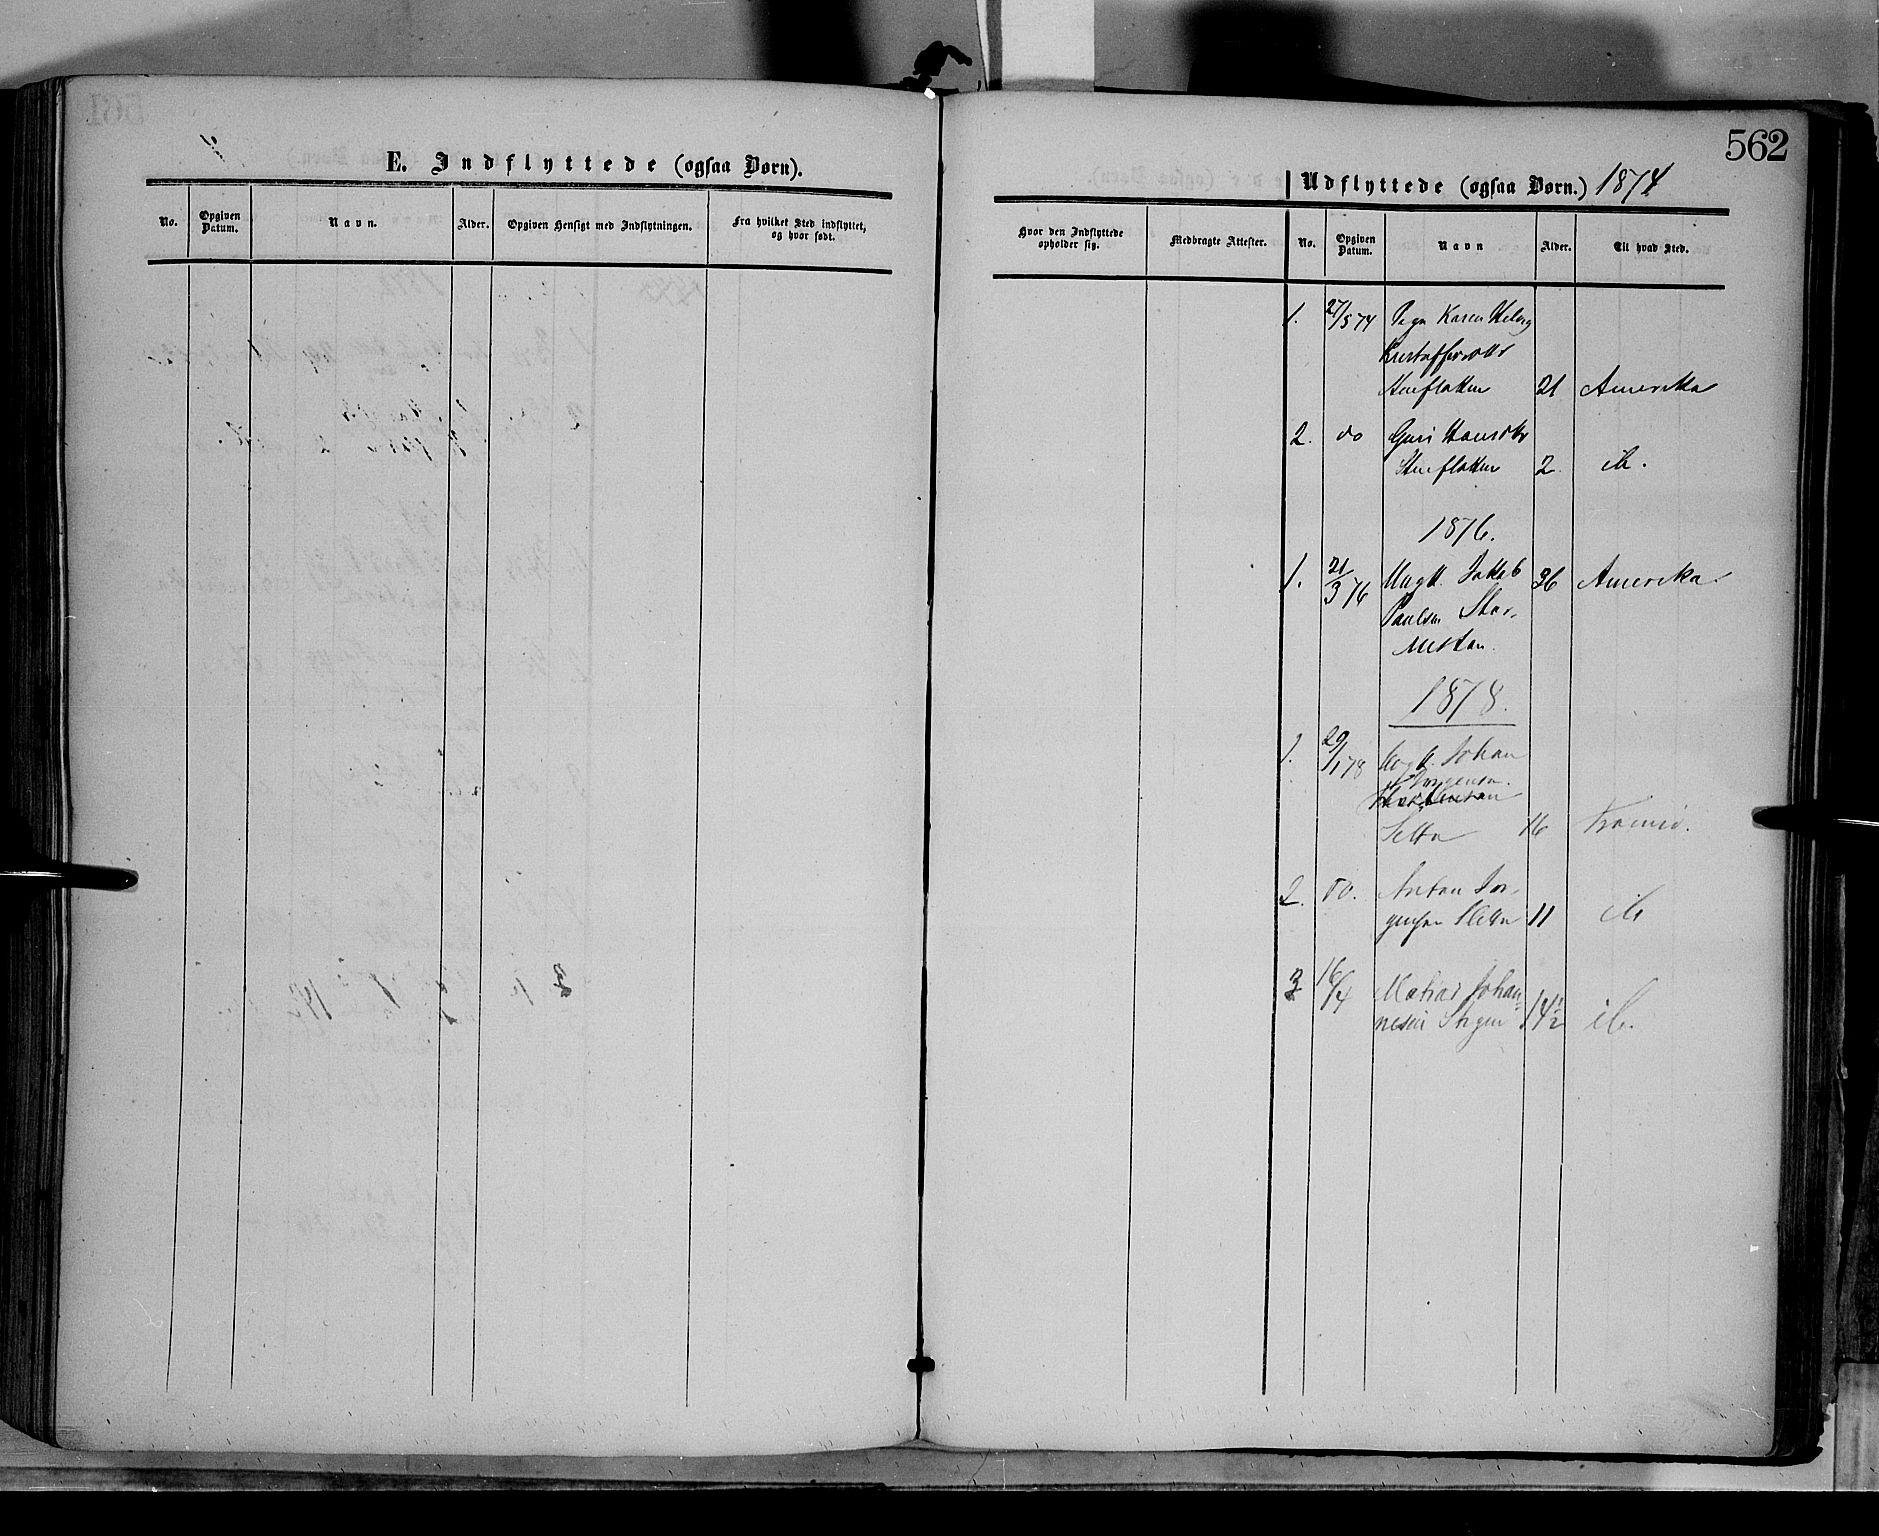 SAH, Dovre prestekontor, Parish register (official) no. 1, 1854-1878, p. 562